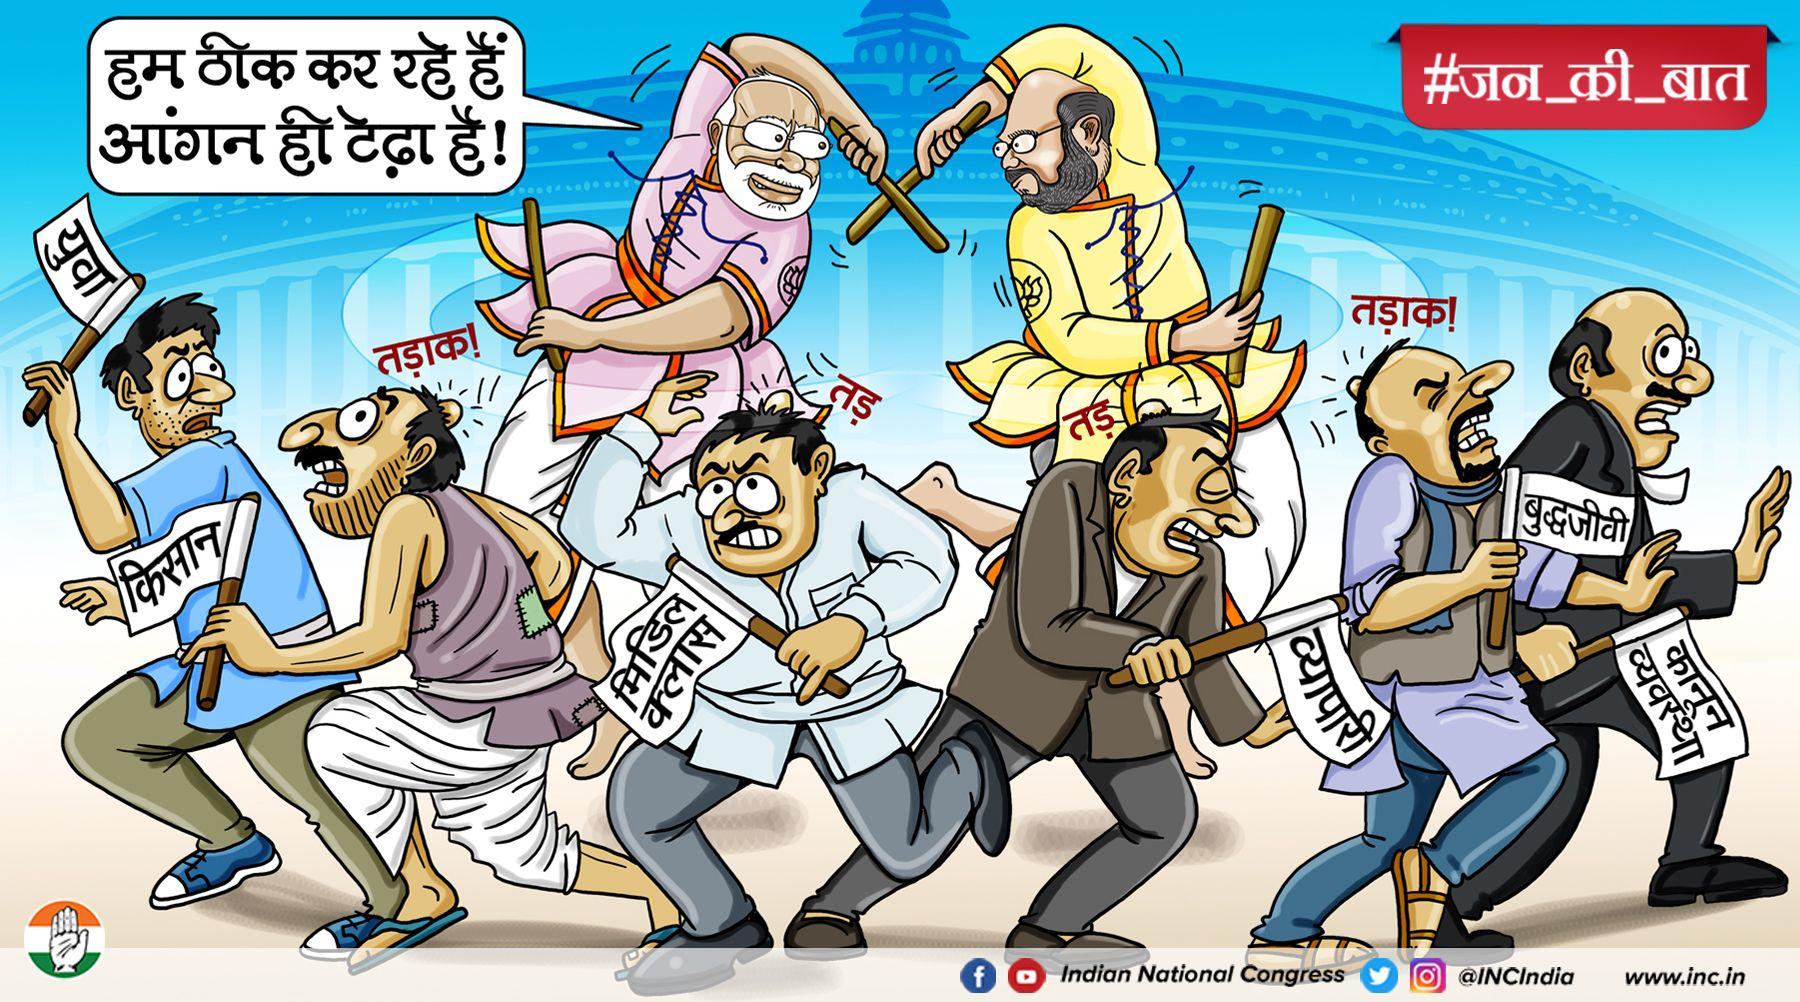 Pin by Muqeem Ur on Indian politics Funny jokes in hindi